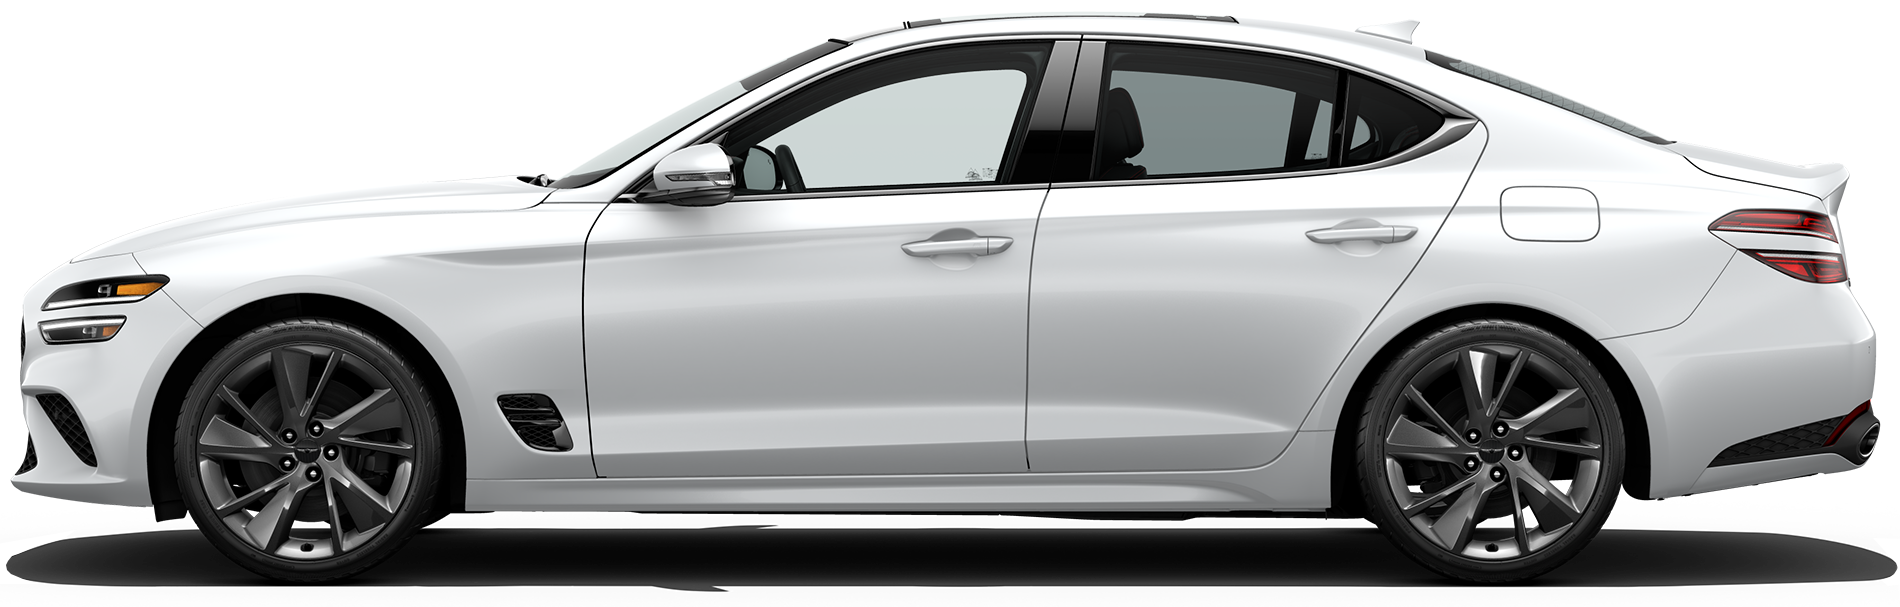 2022 Genesis G70 Sedan 3.3T